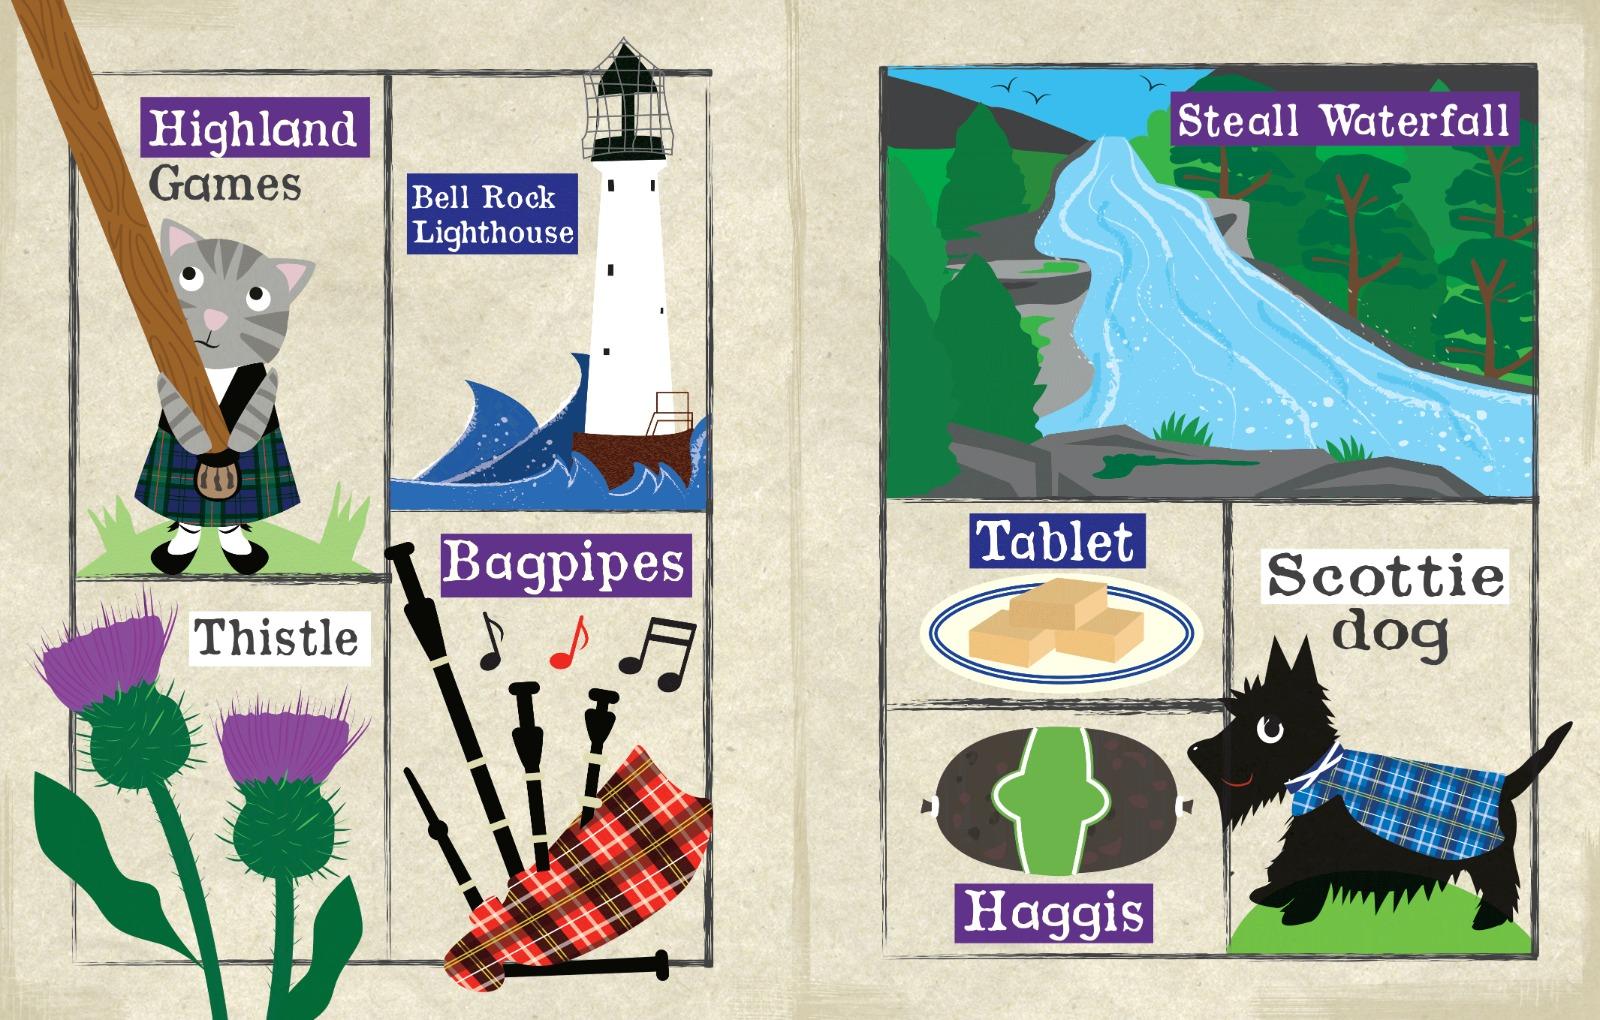 Nursery Times Crinkly Newspaper - Welcome to Scotland